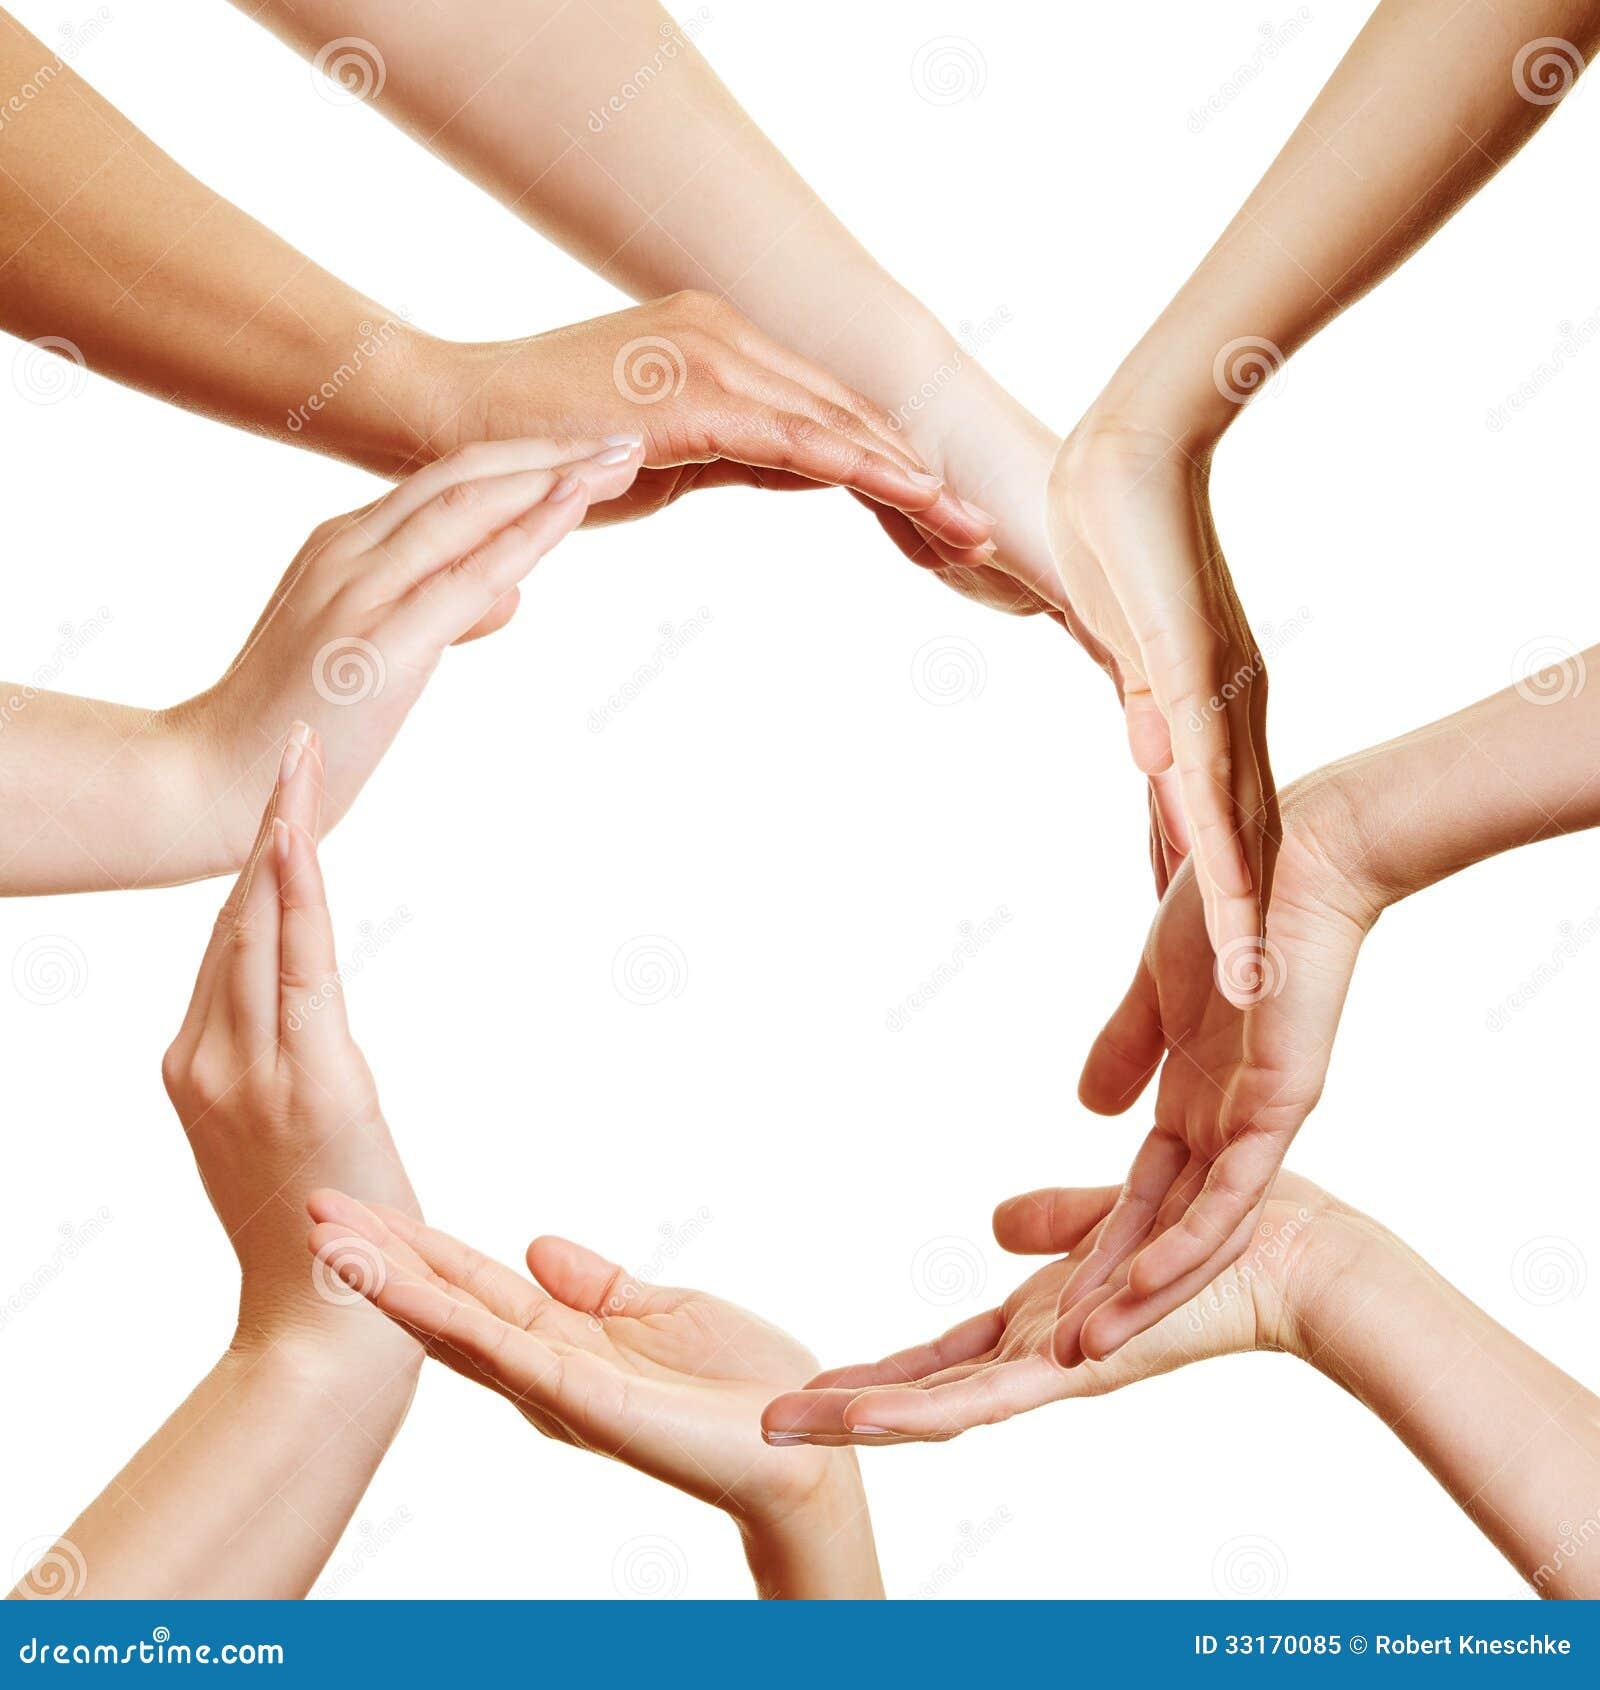 Many Hands Forming A Circle Royalty Free Stock Photo - Image: 33170085